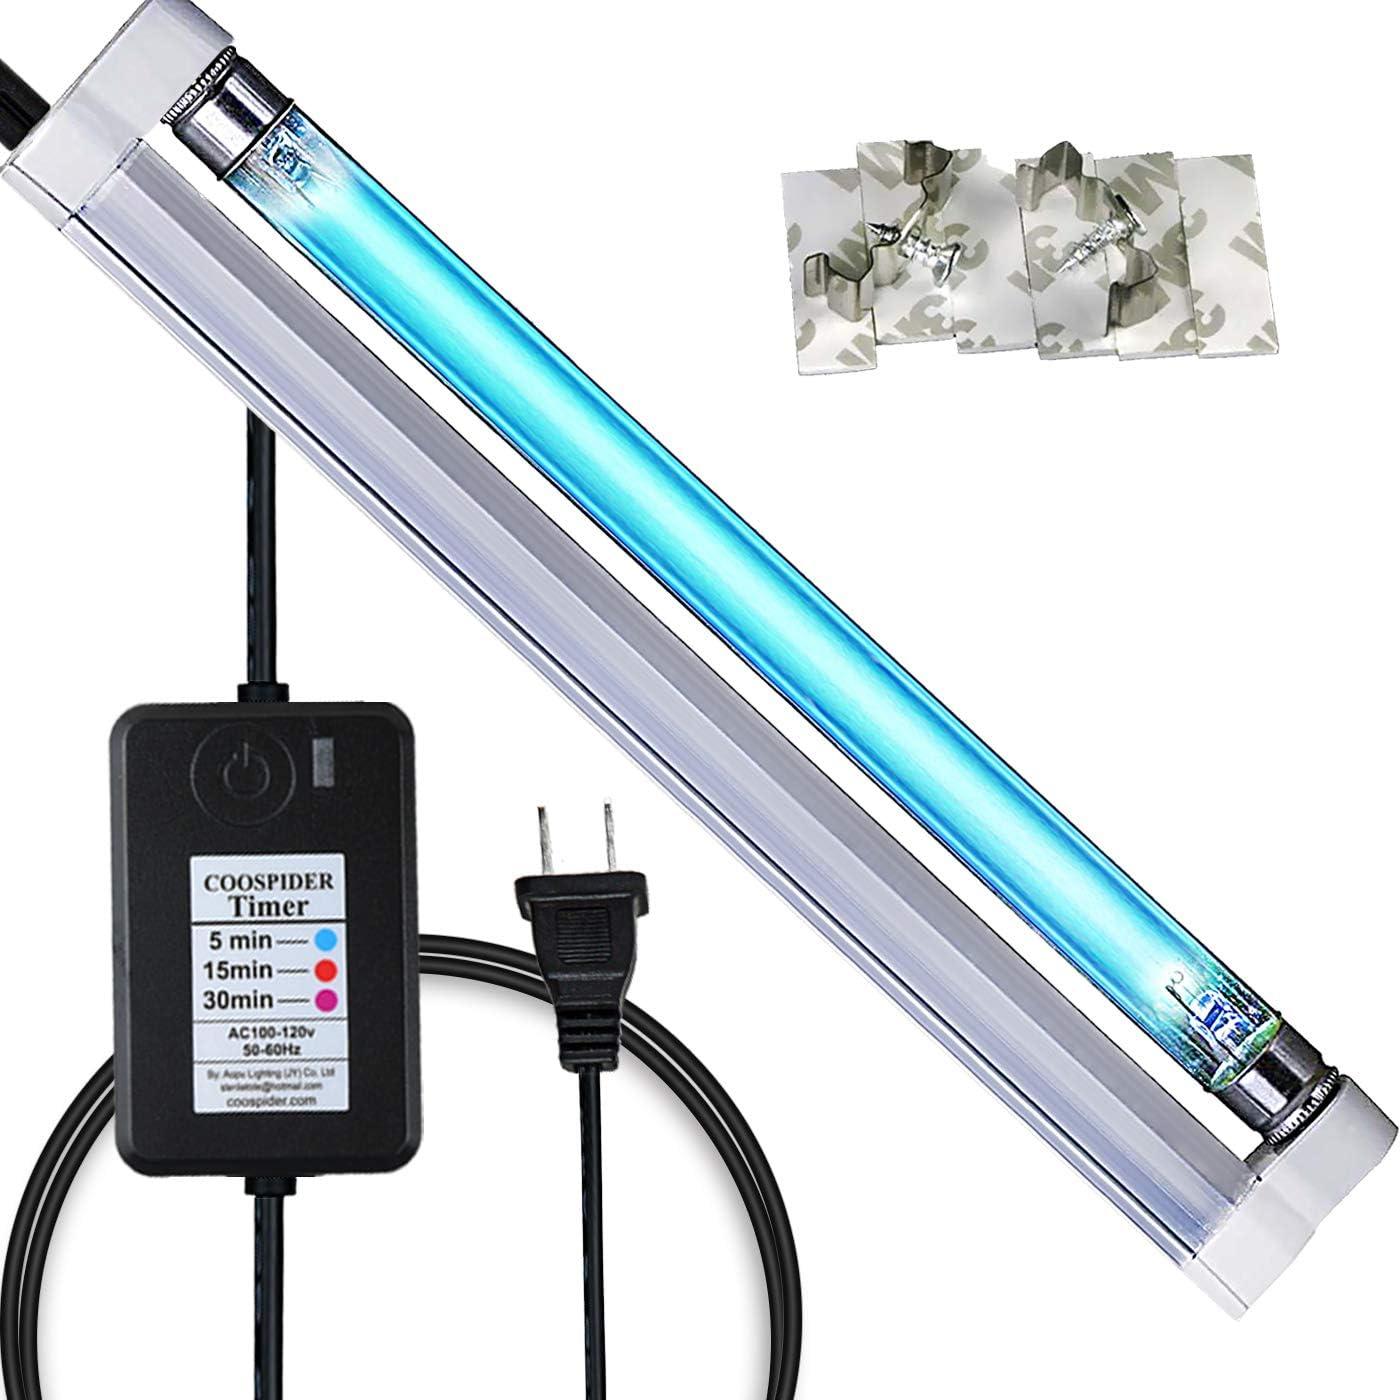 U/V Ozone Lamp U/V/C Light Bulb Quartz Lamp Household 6W Timer 5/15/30 Minutes Control for Closet, Kitchen, Bathroom, loft, Basement